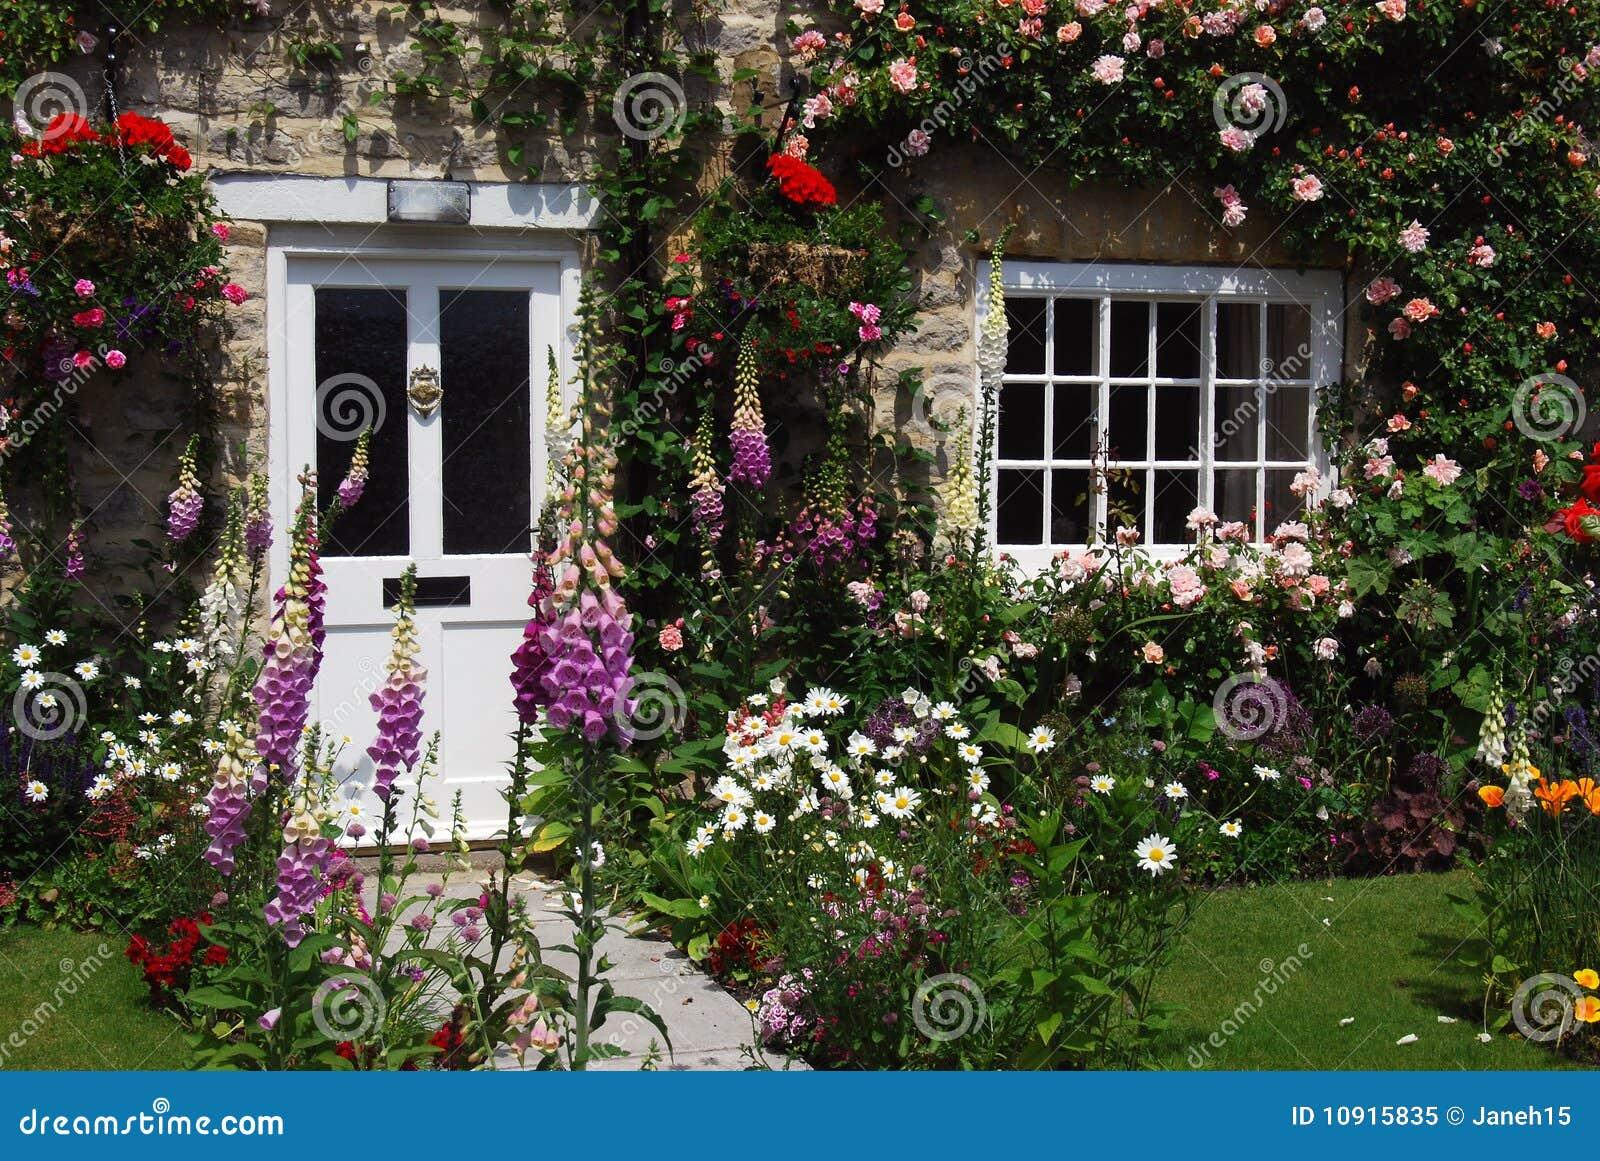 English Cottage Garden Royalty Free Stock Photo Image